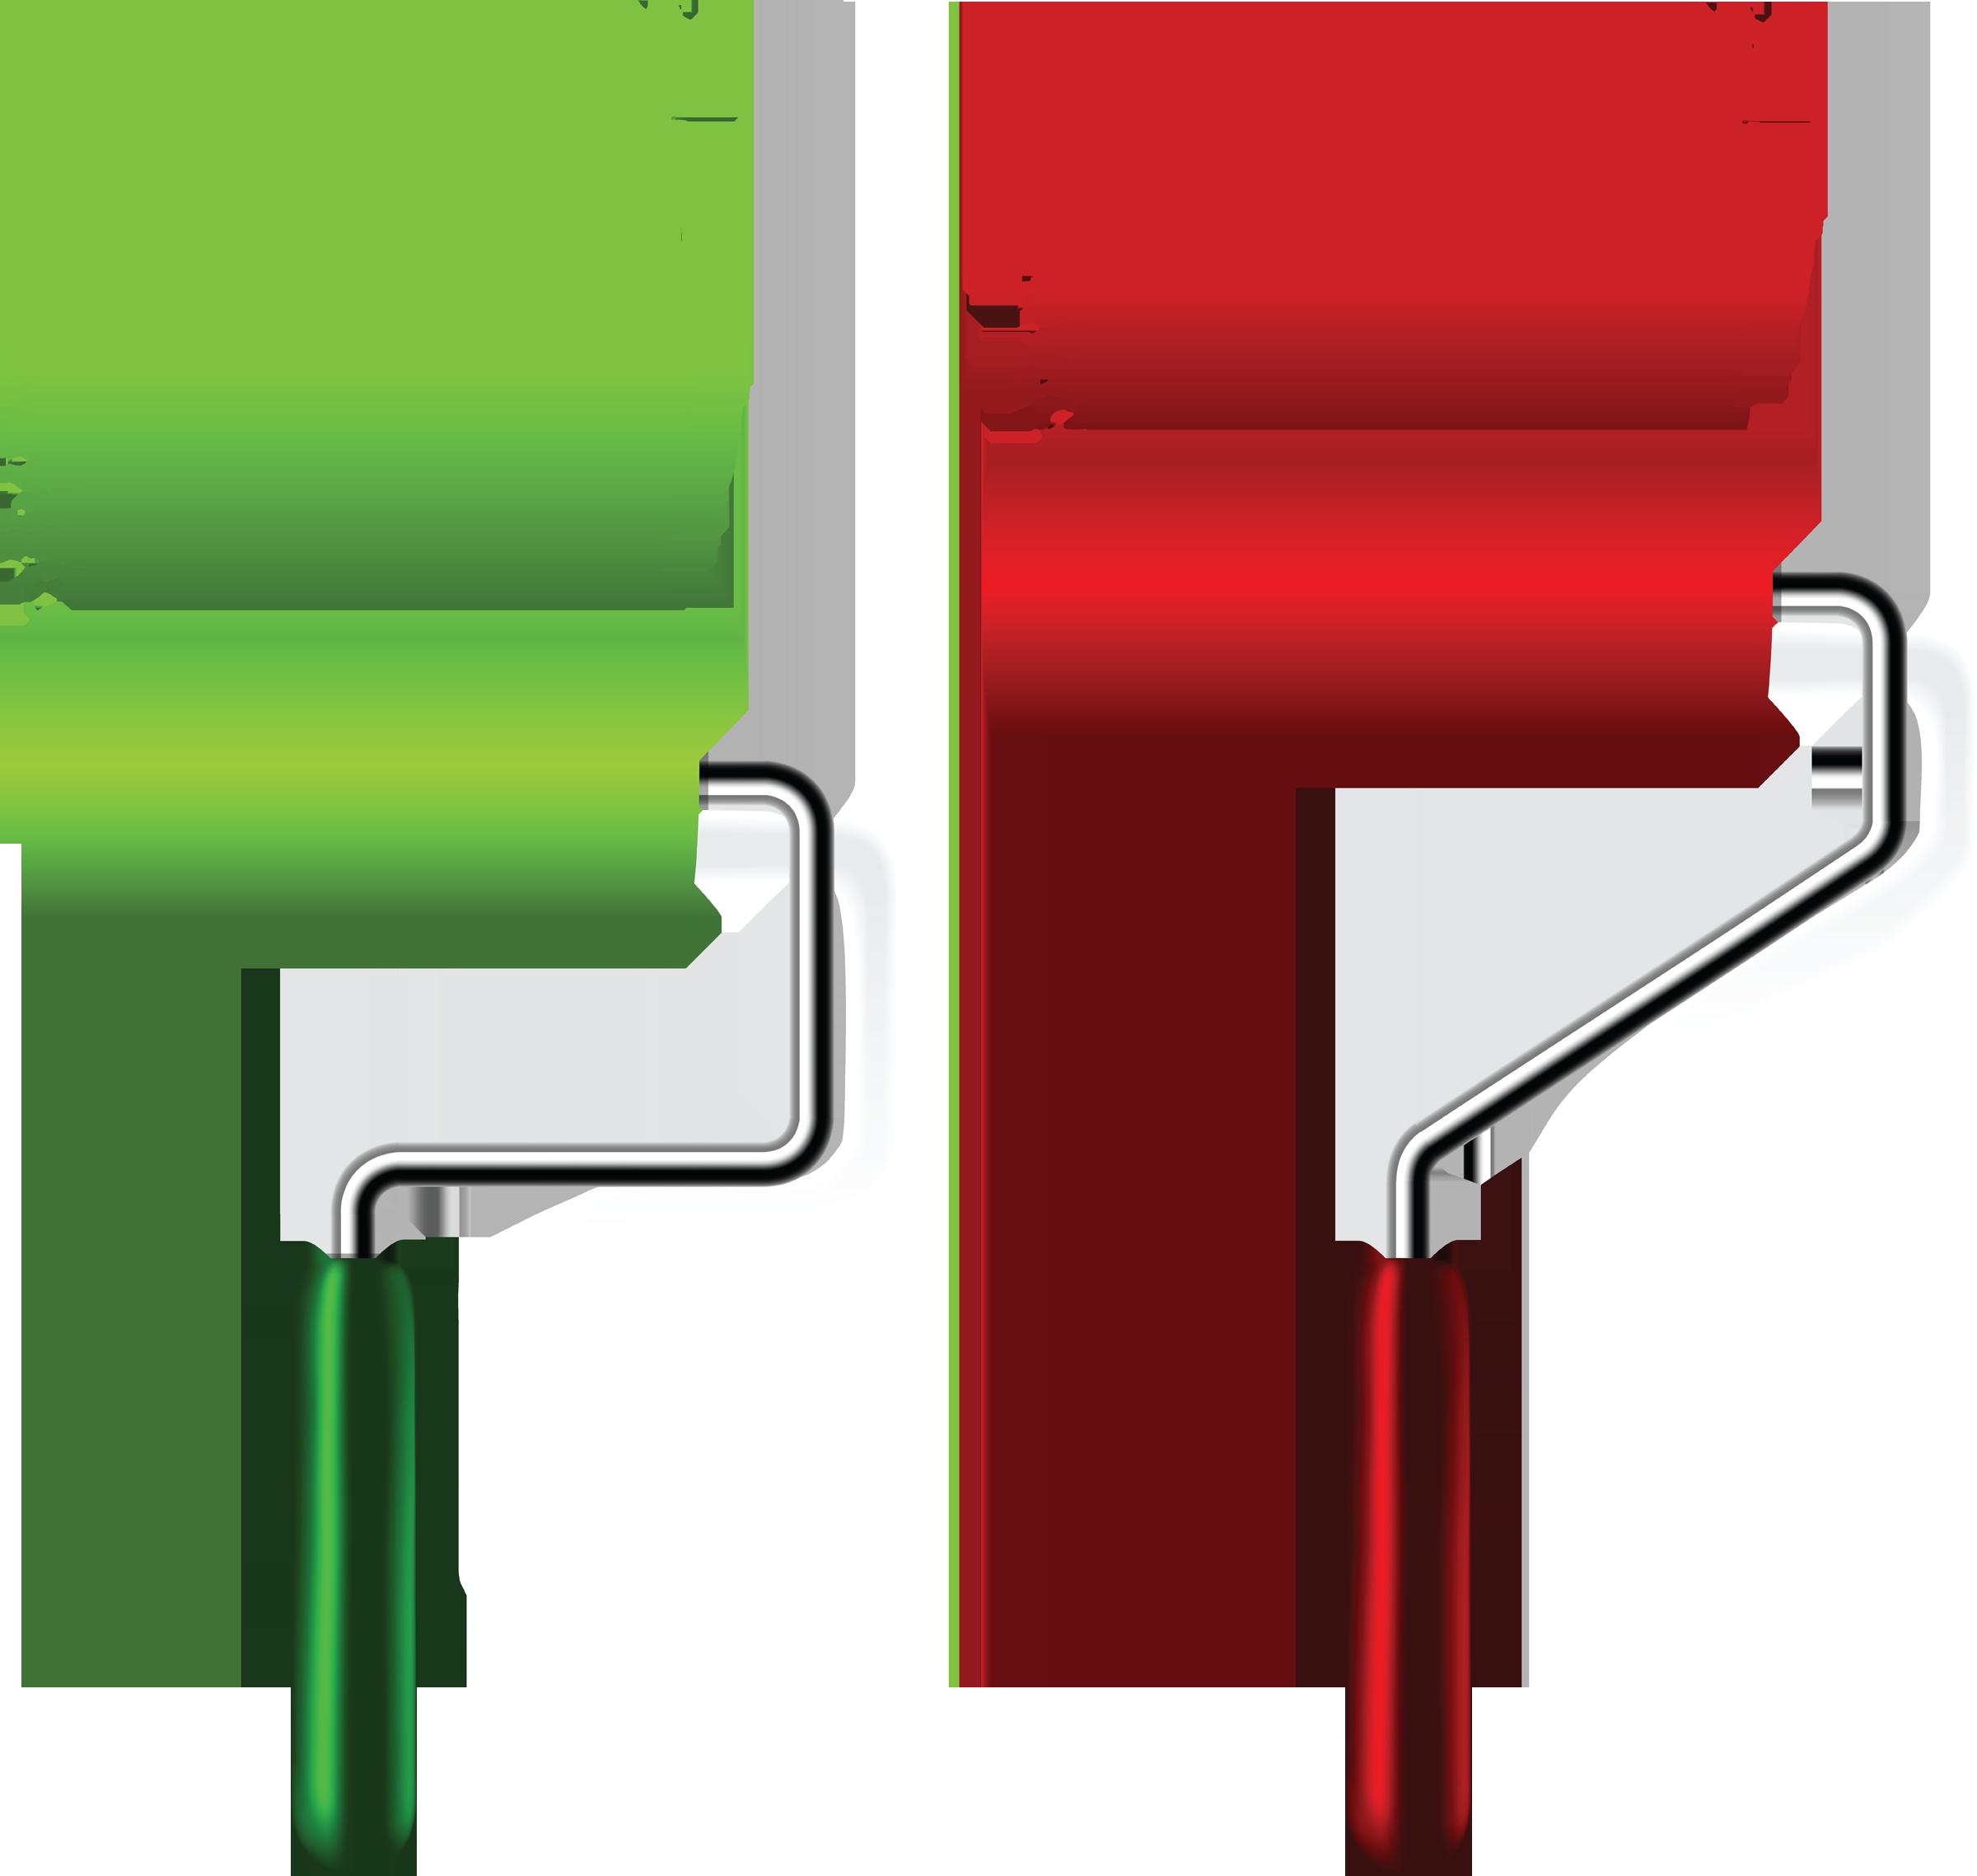 Paint roller logo panda. Paintbrush clipart wall